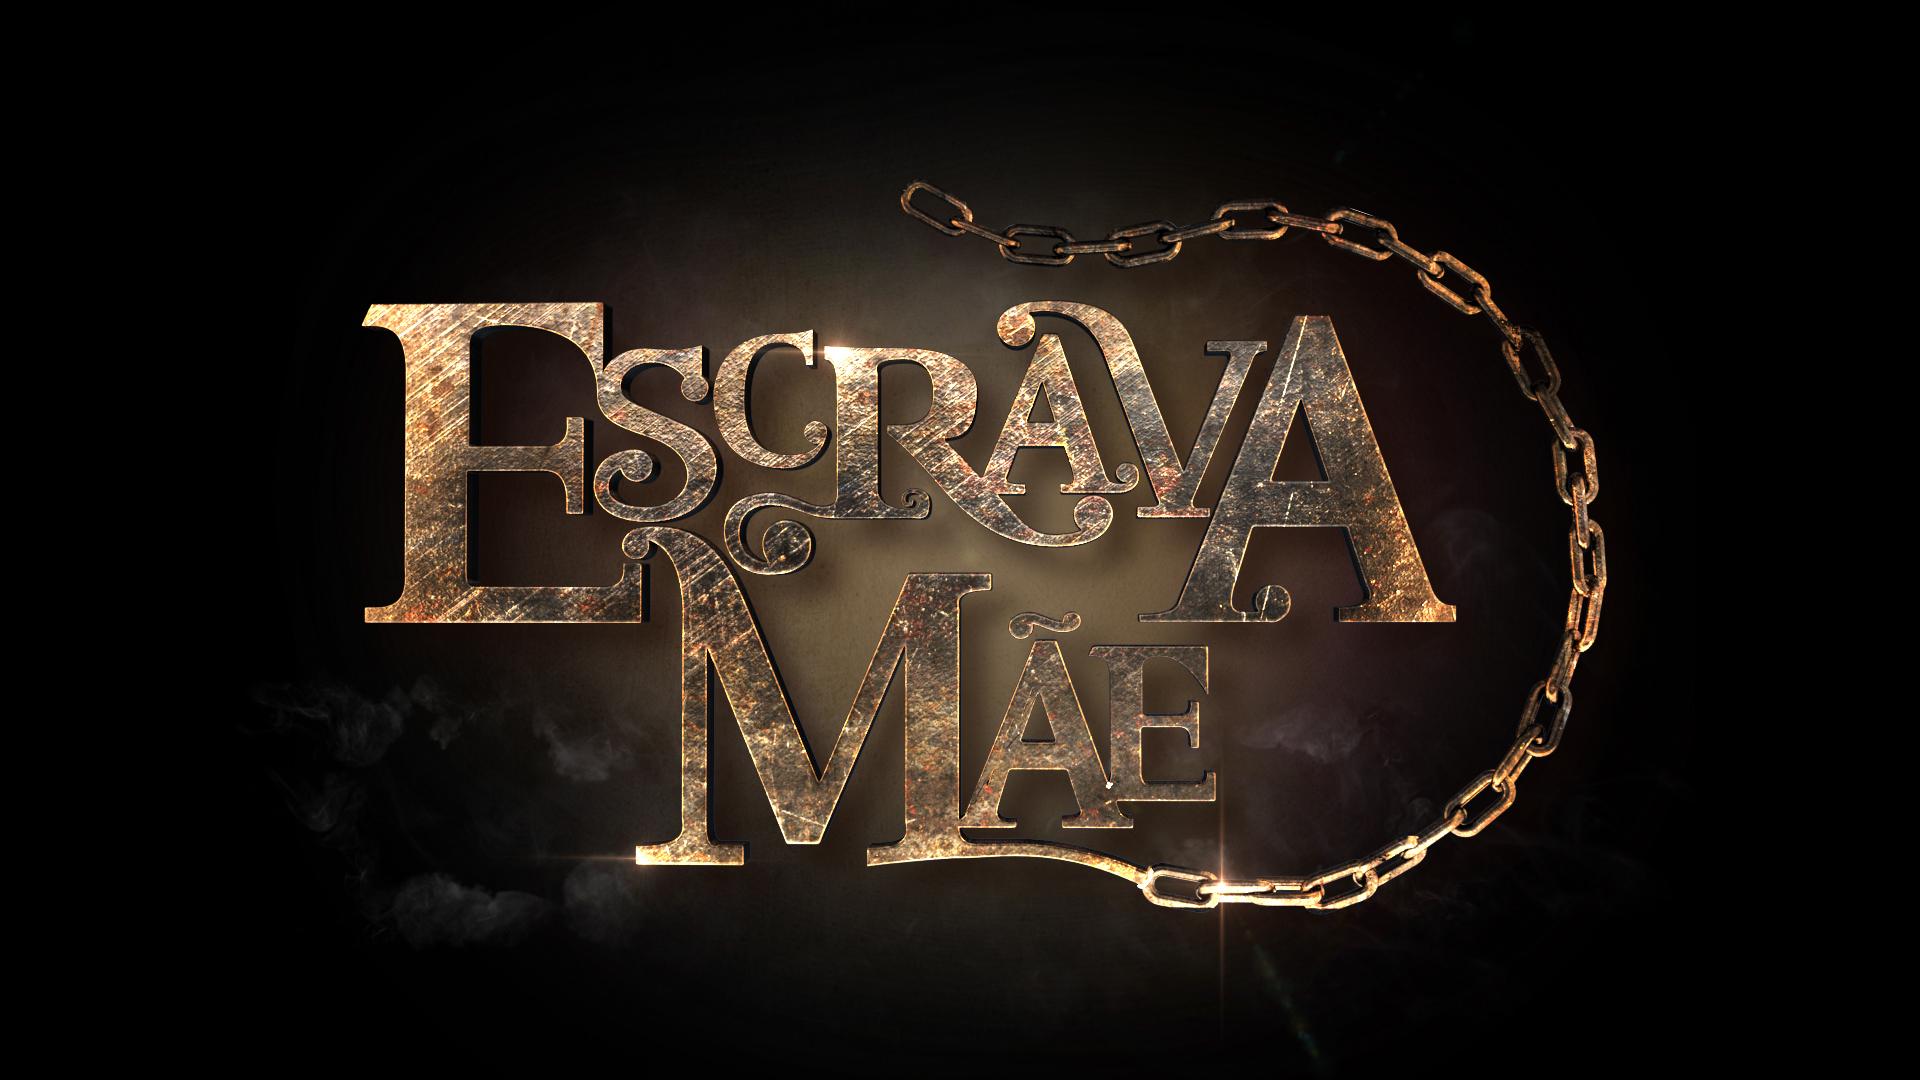 ESCRAVA_MAE